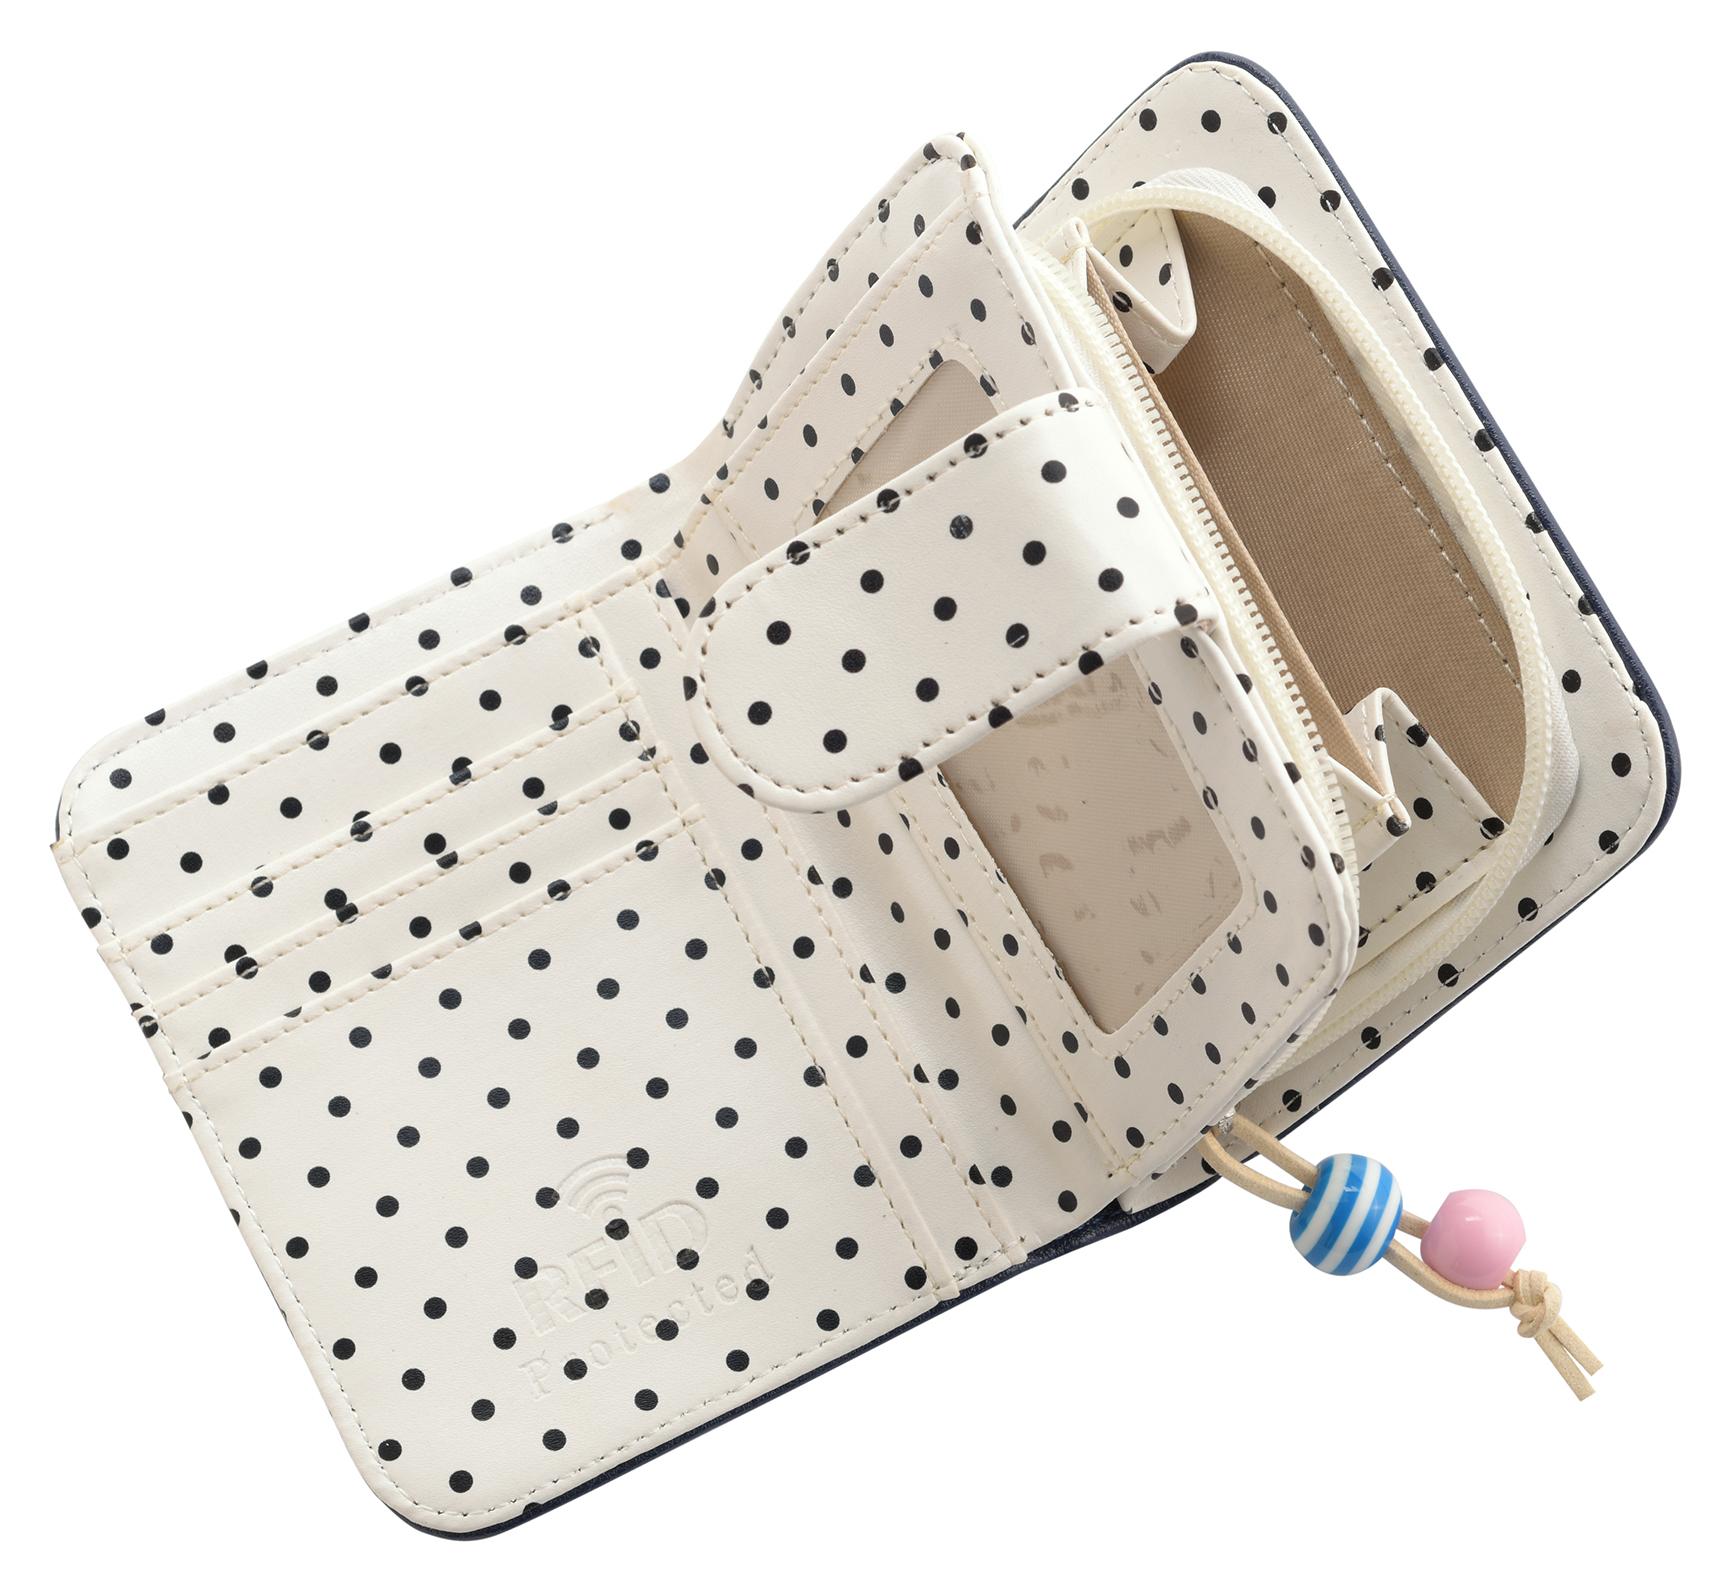 Mesdames-RFID-Bloquant-Petites-En-Faux-Cuir-Polka-Dot-Sac-zippee miniature 11